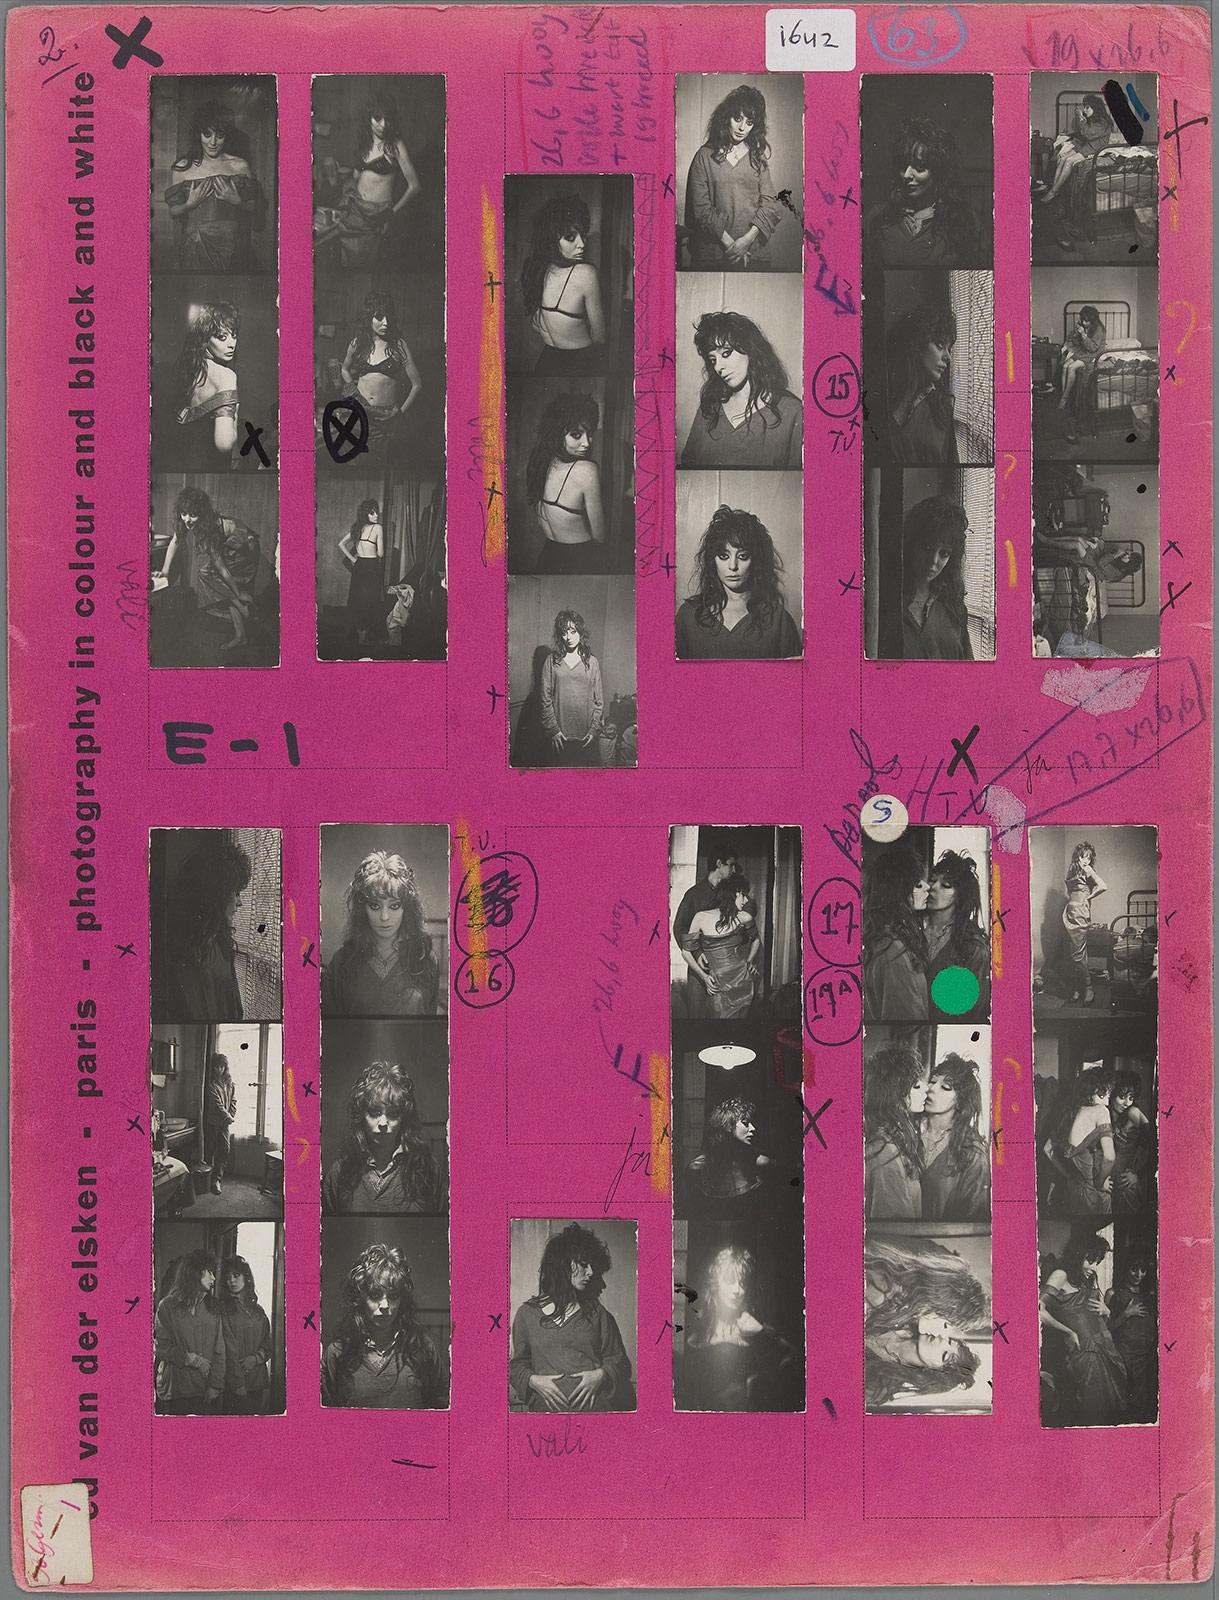 Nederlandsfotomuseum edvanderelsken metalmagazine 11